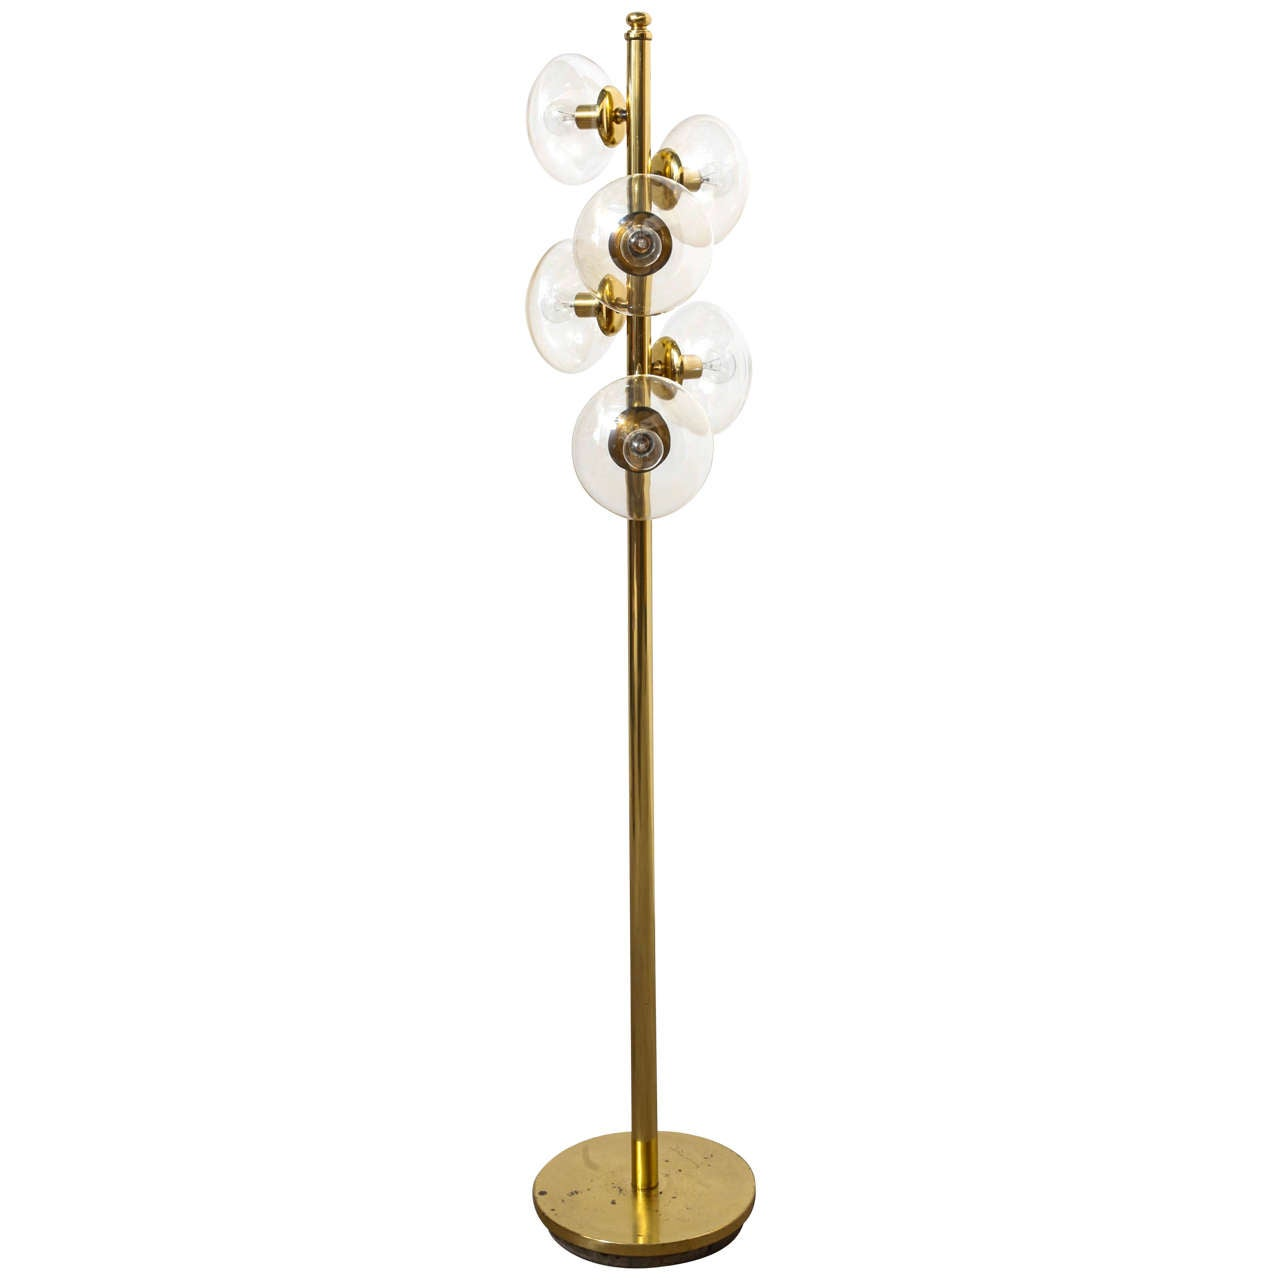 Beautiful Functional Rare Kaiser Brass Floor Lamp, 1970s